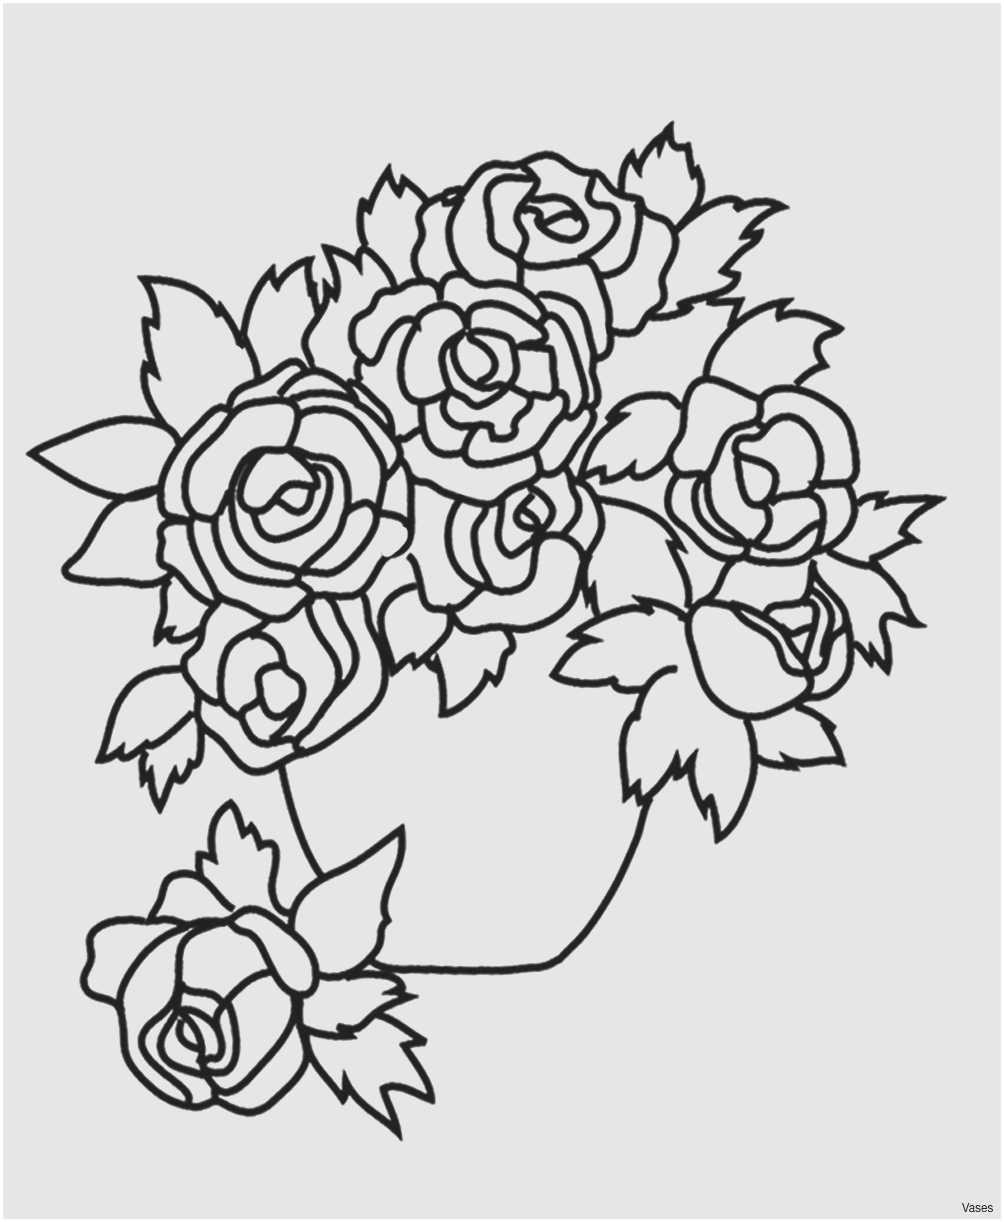 clear trumpet vase of 16 lovely flowers in a tall white vase bogekompresorturkiye com pertaining to vases flowers in vase coloring pages a flower top i 0d flowers awesome